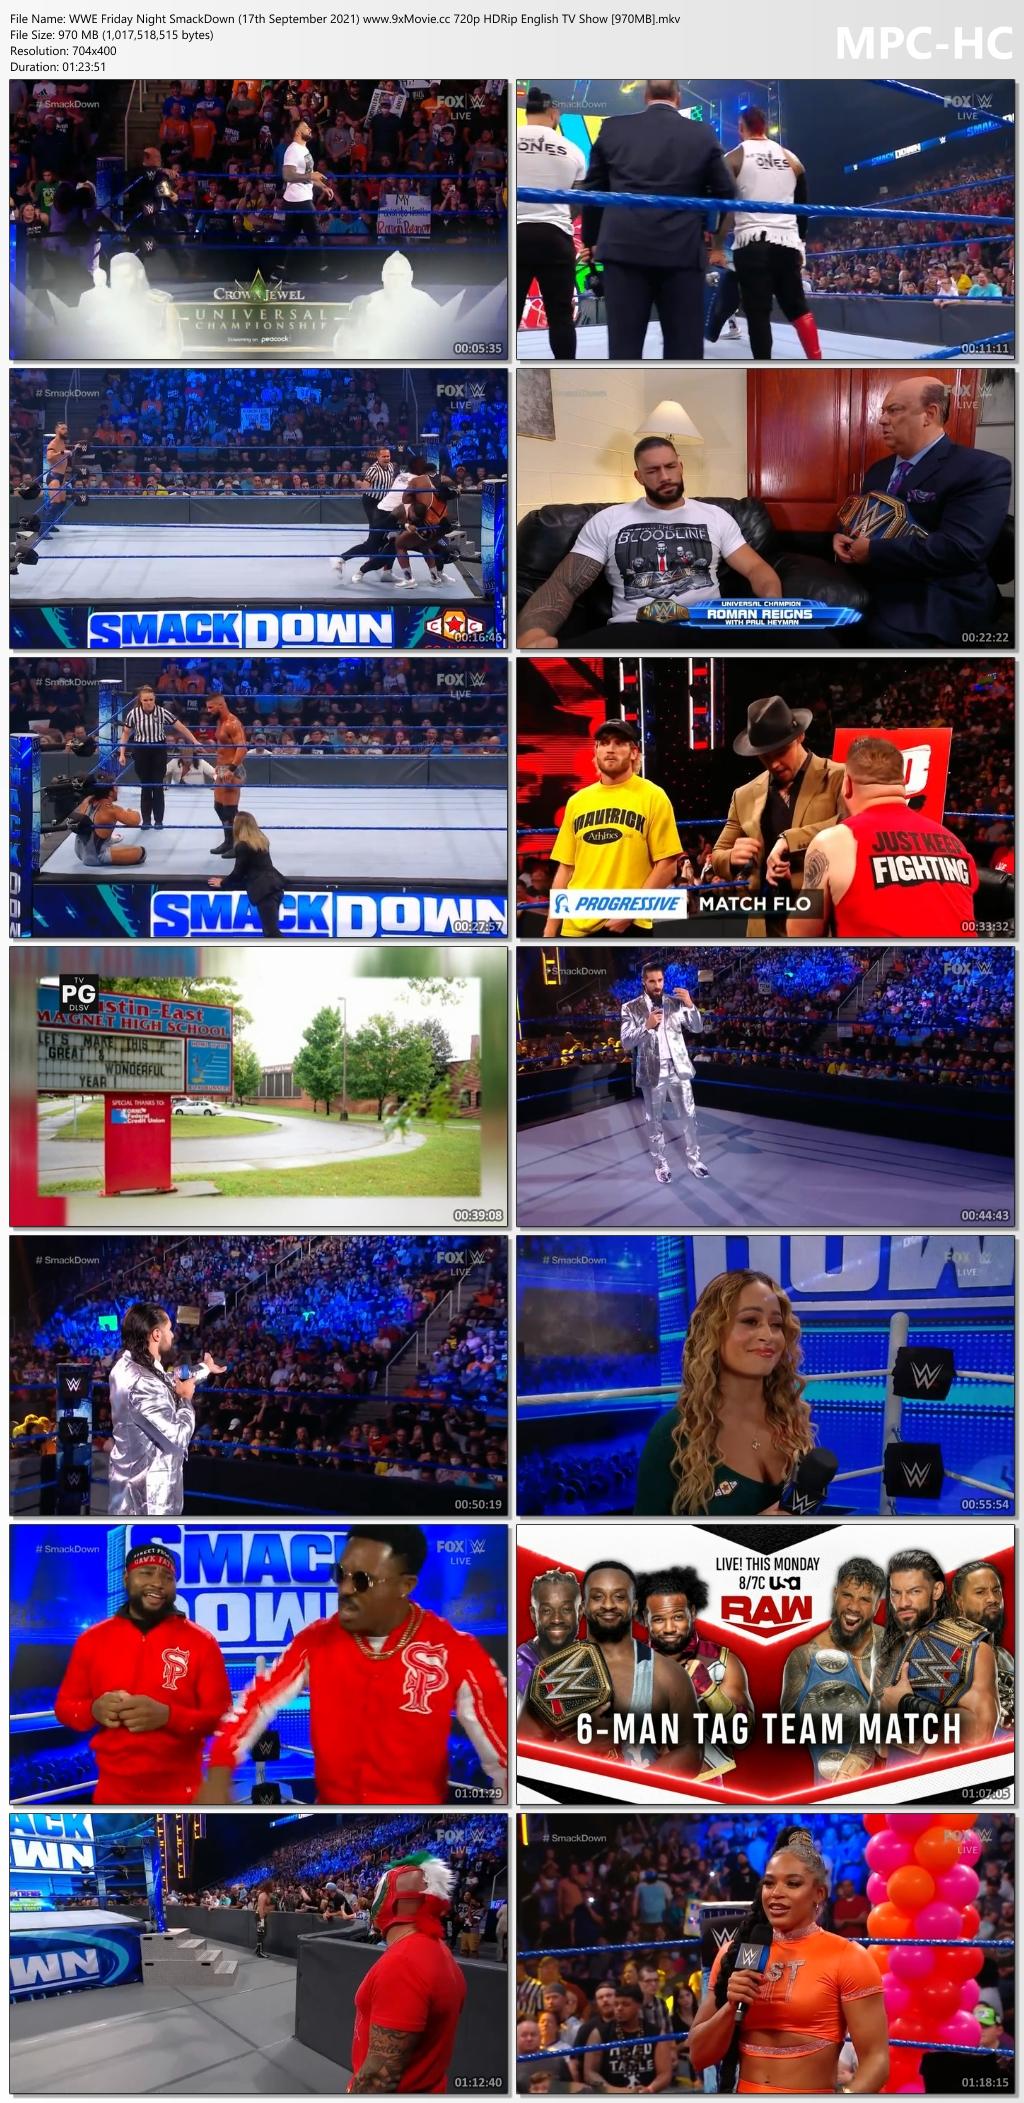 WWE-Friday-Night-Smack-Down-17th-September-2021-www-9x-Movie-cc-720p-HDRip-English-TV-Show-970-MB-mk